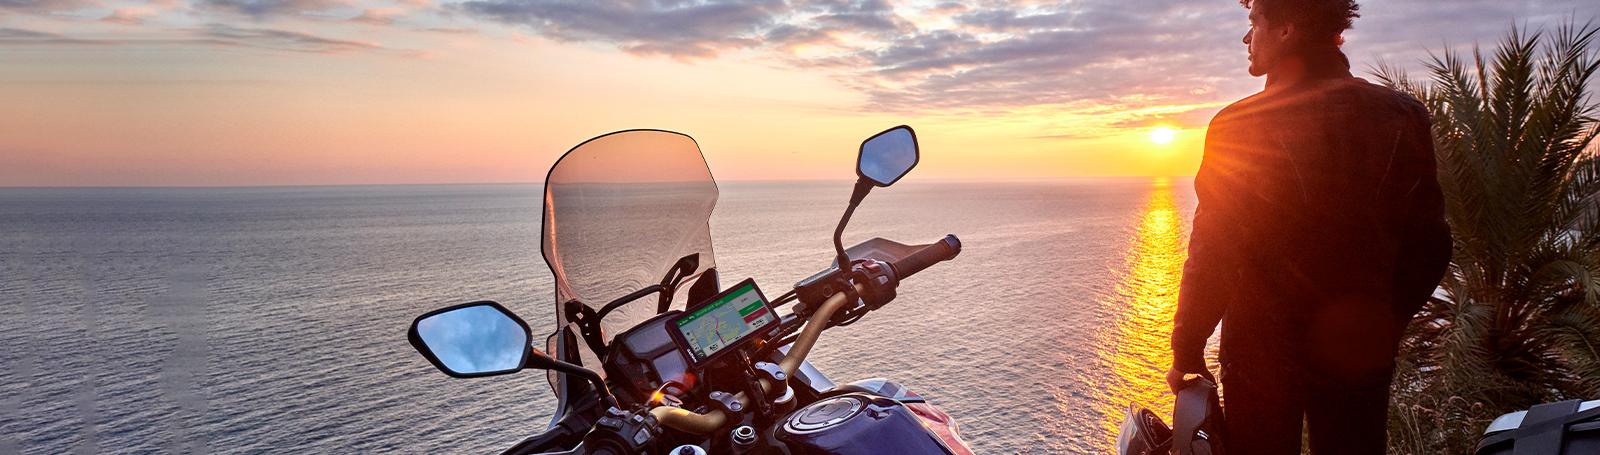 Garmin Zumo XT GPS Moto - Test & Avis - Mon GPS Avis.fr